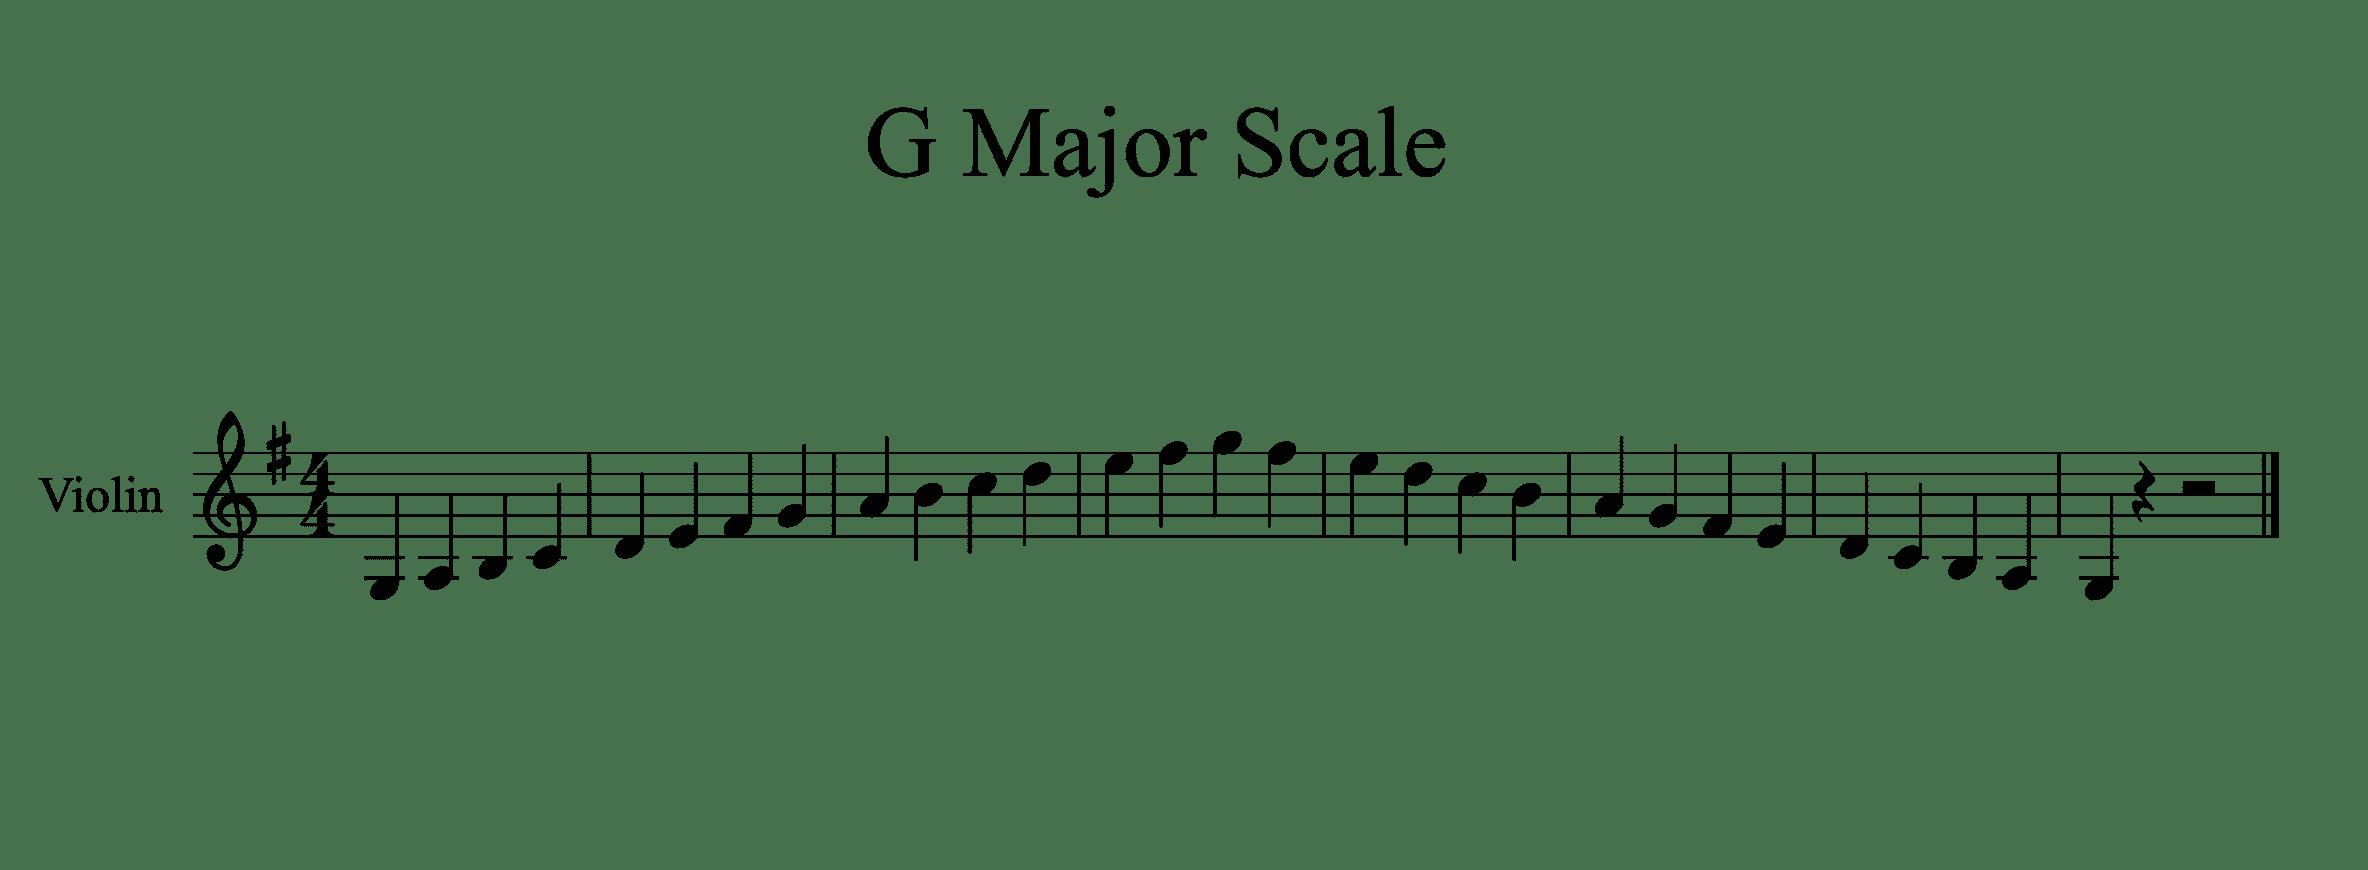 E major chord on